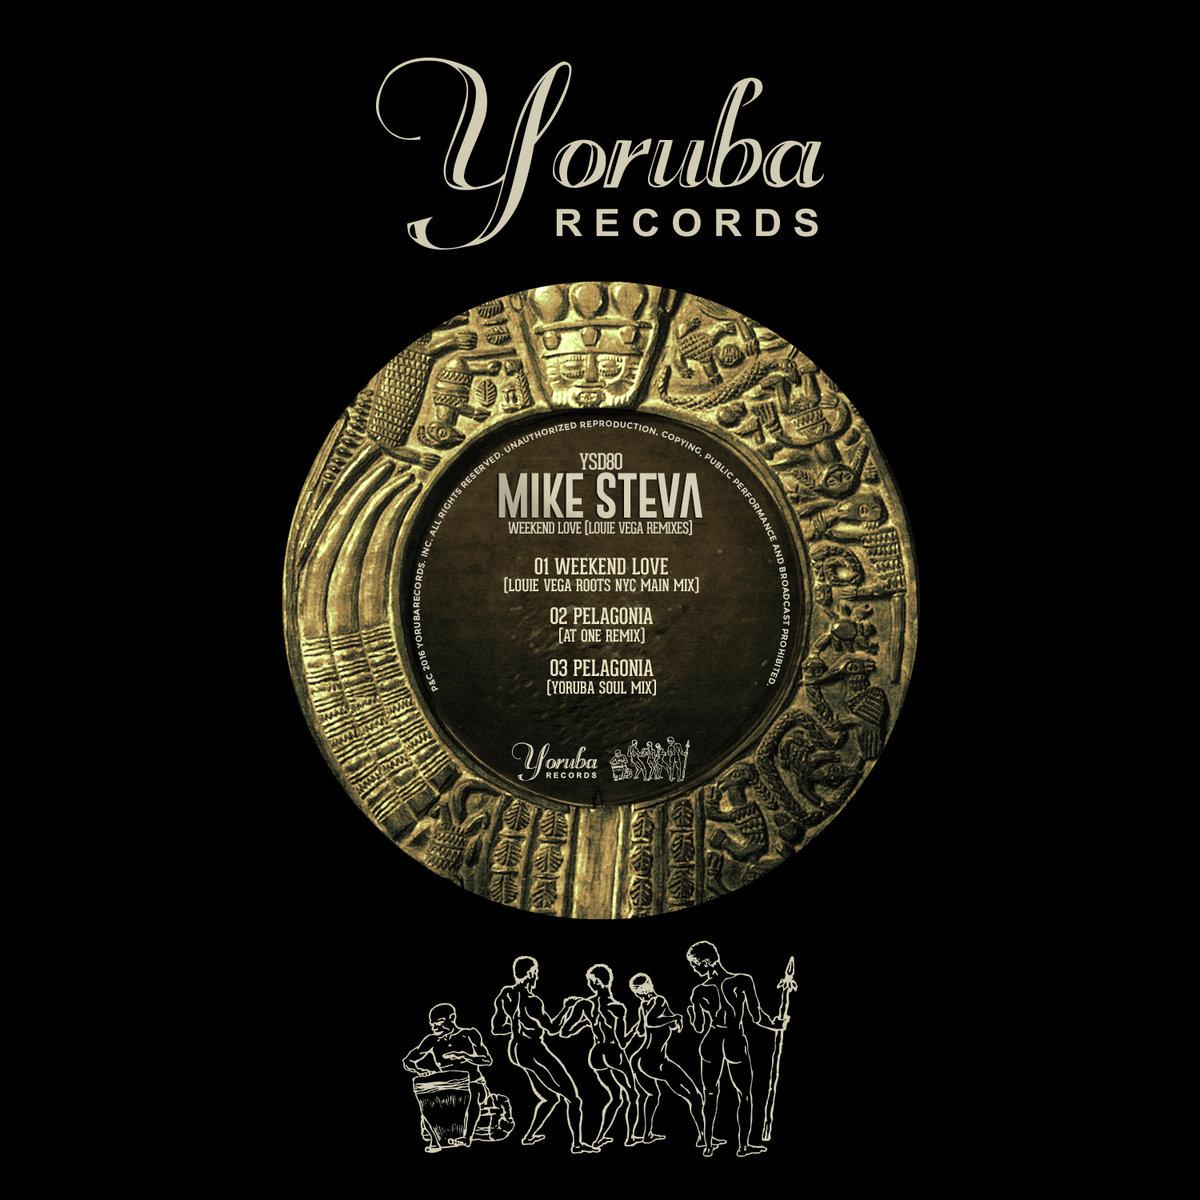 Pelagonia (Yoruba Soul Mix) | Yoruba Records